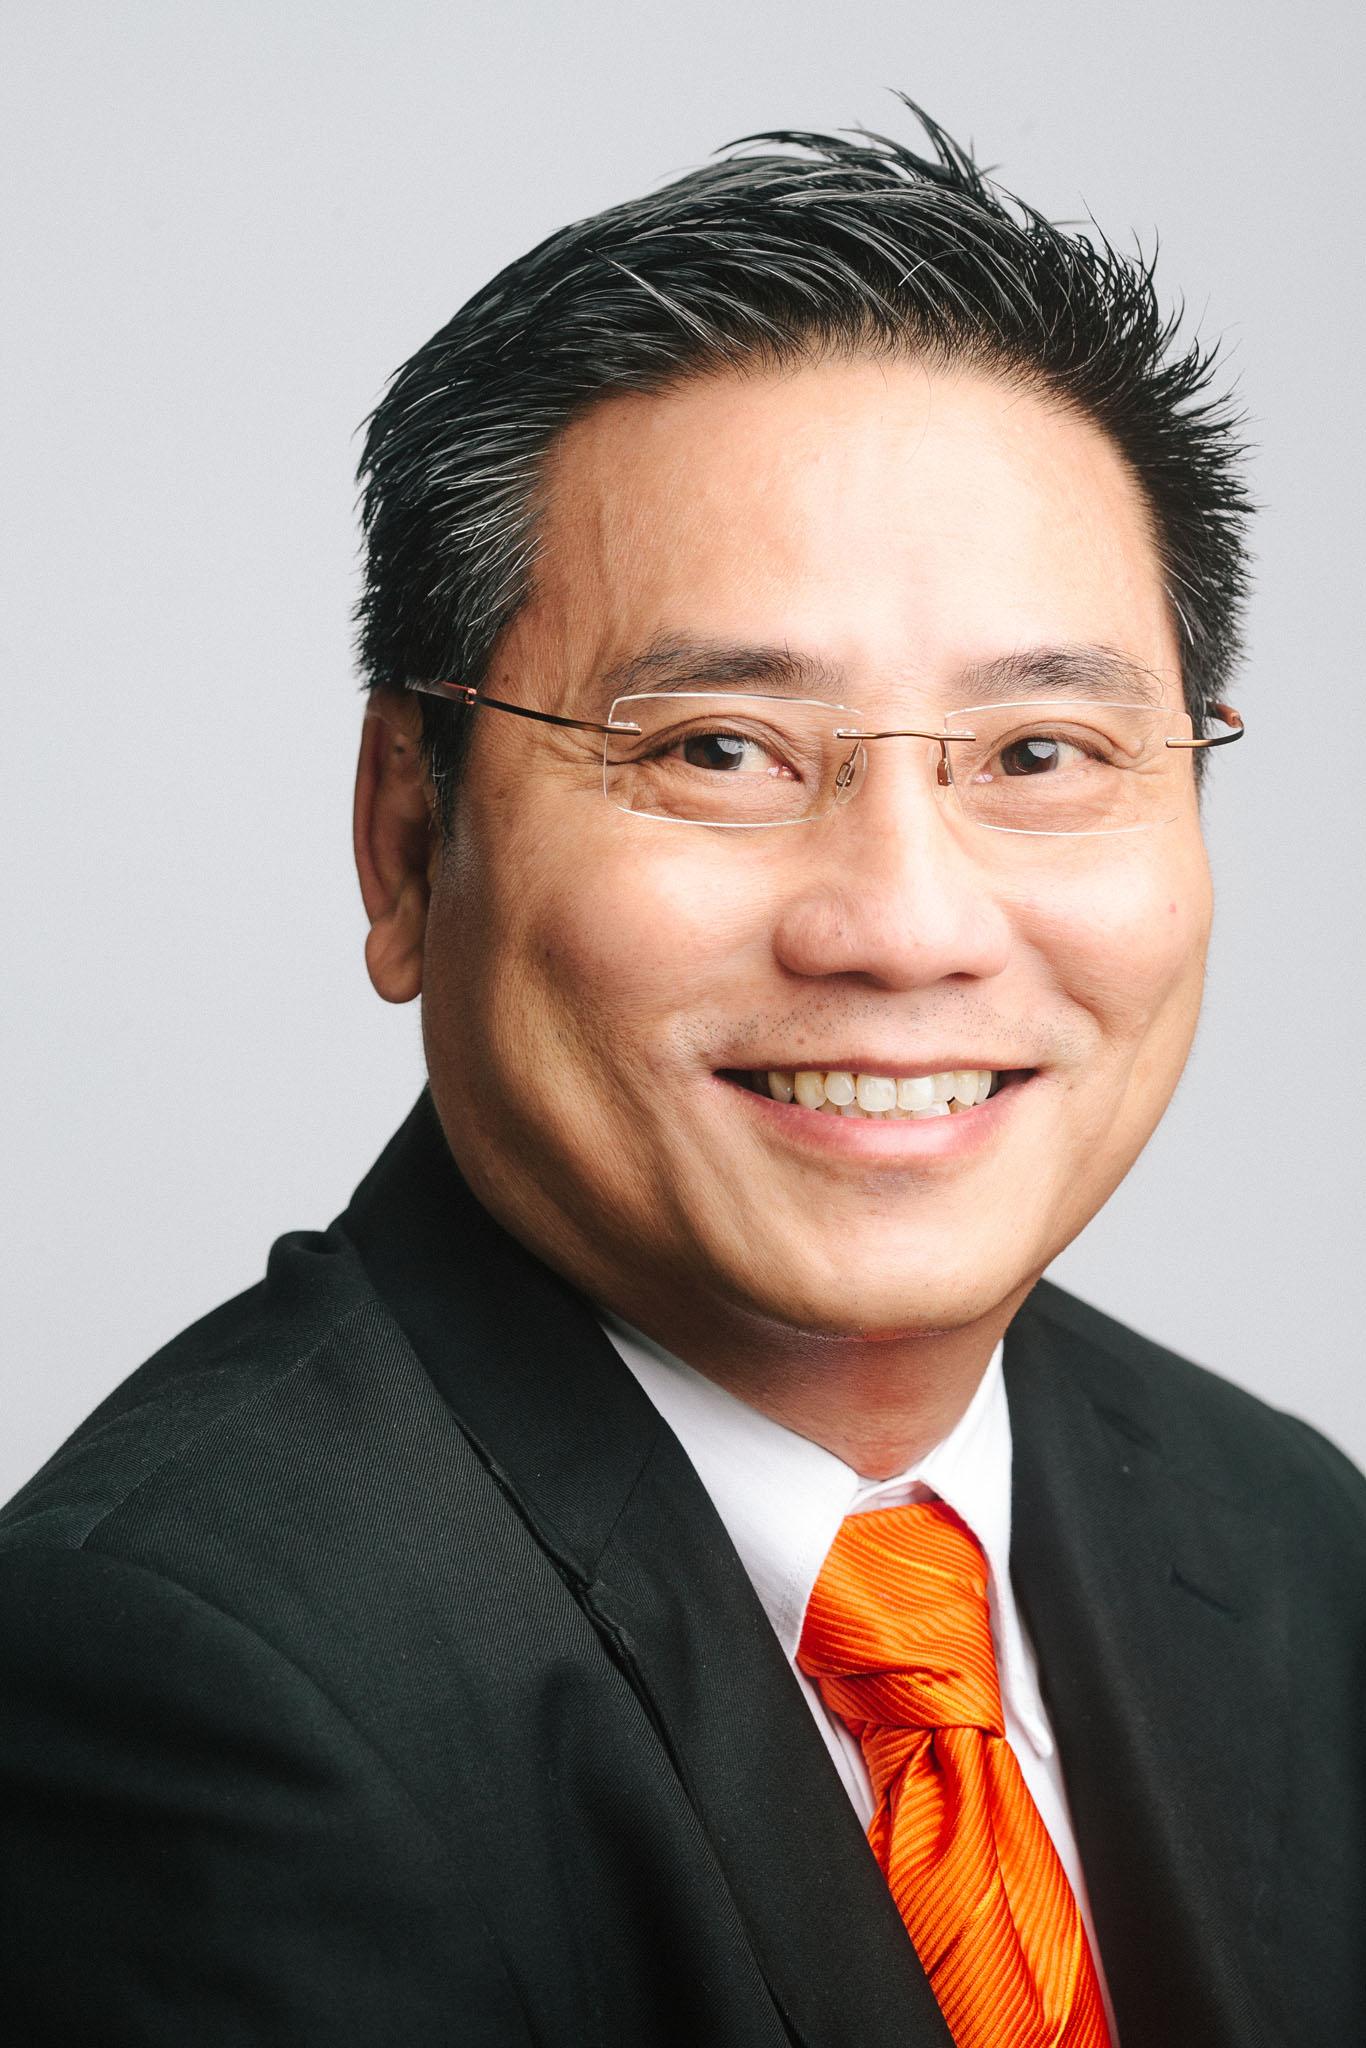 singapore-commercial-editorial-photographer-portraiture-jj-lapp-zakaria-zainal-01.jpg